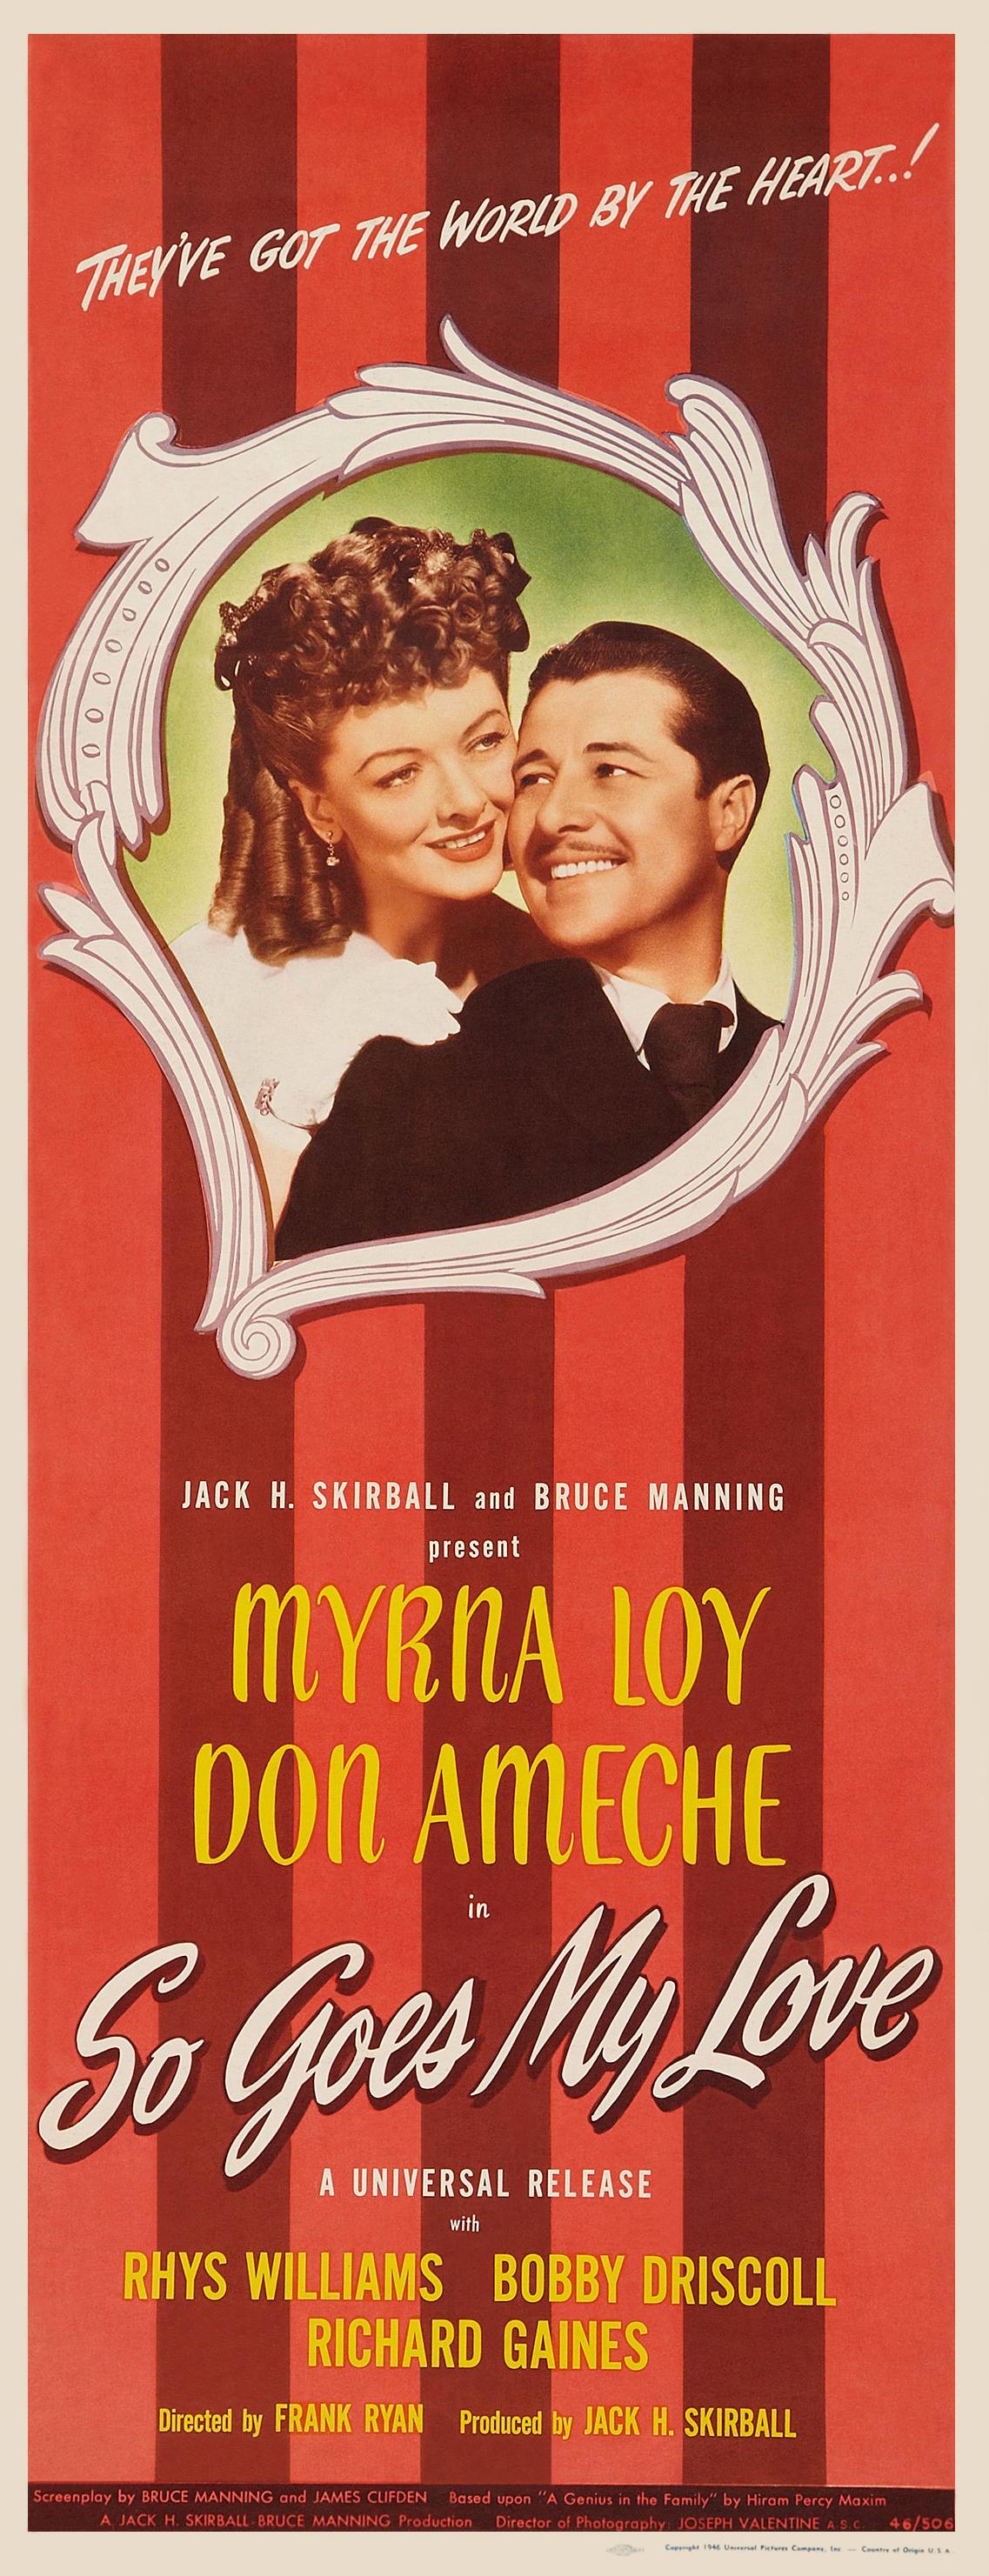 So Goes My Love 1946